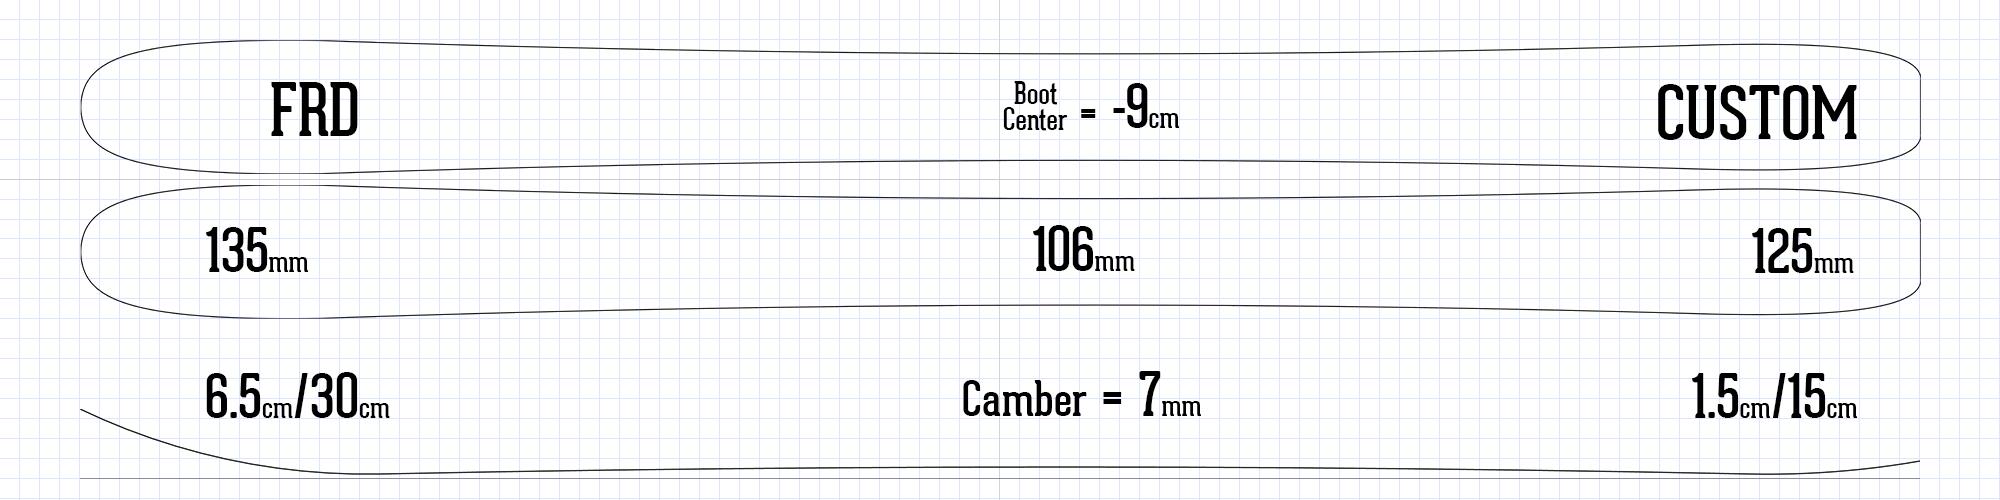 FRD ski information spec sheet